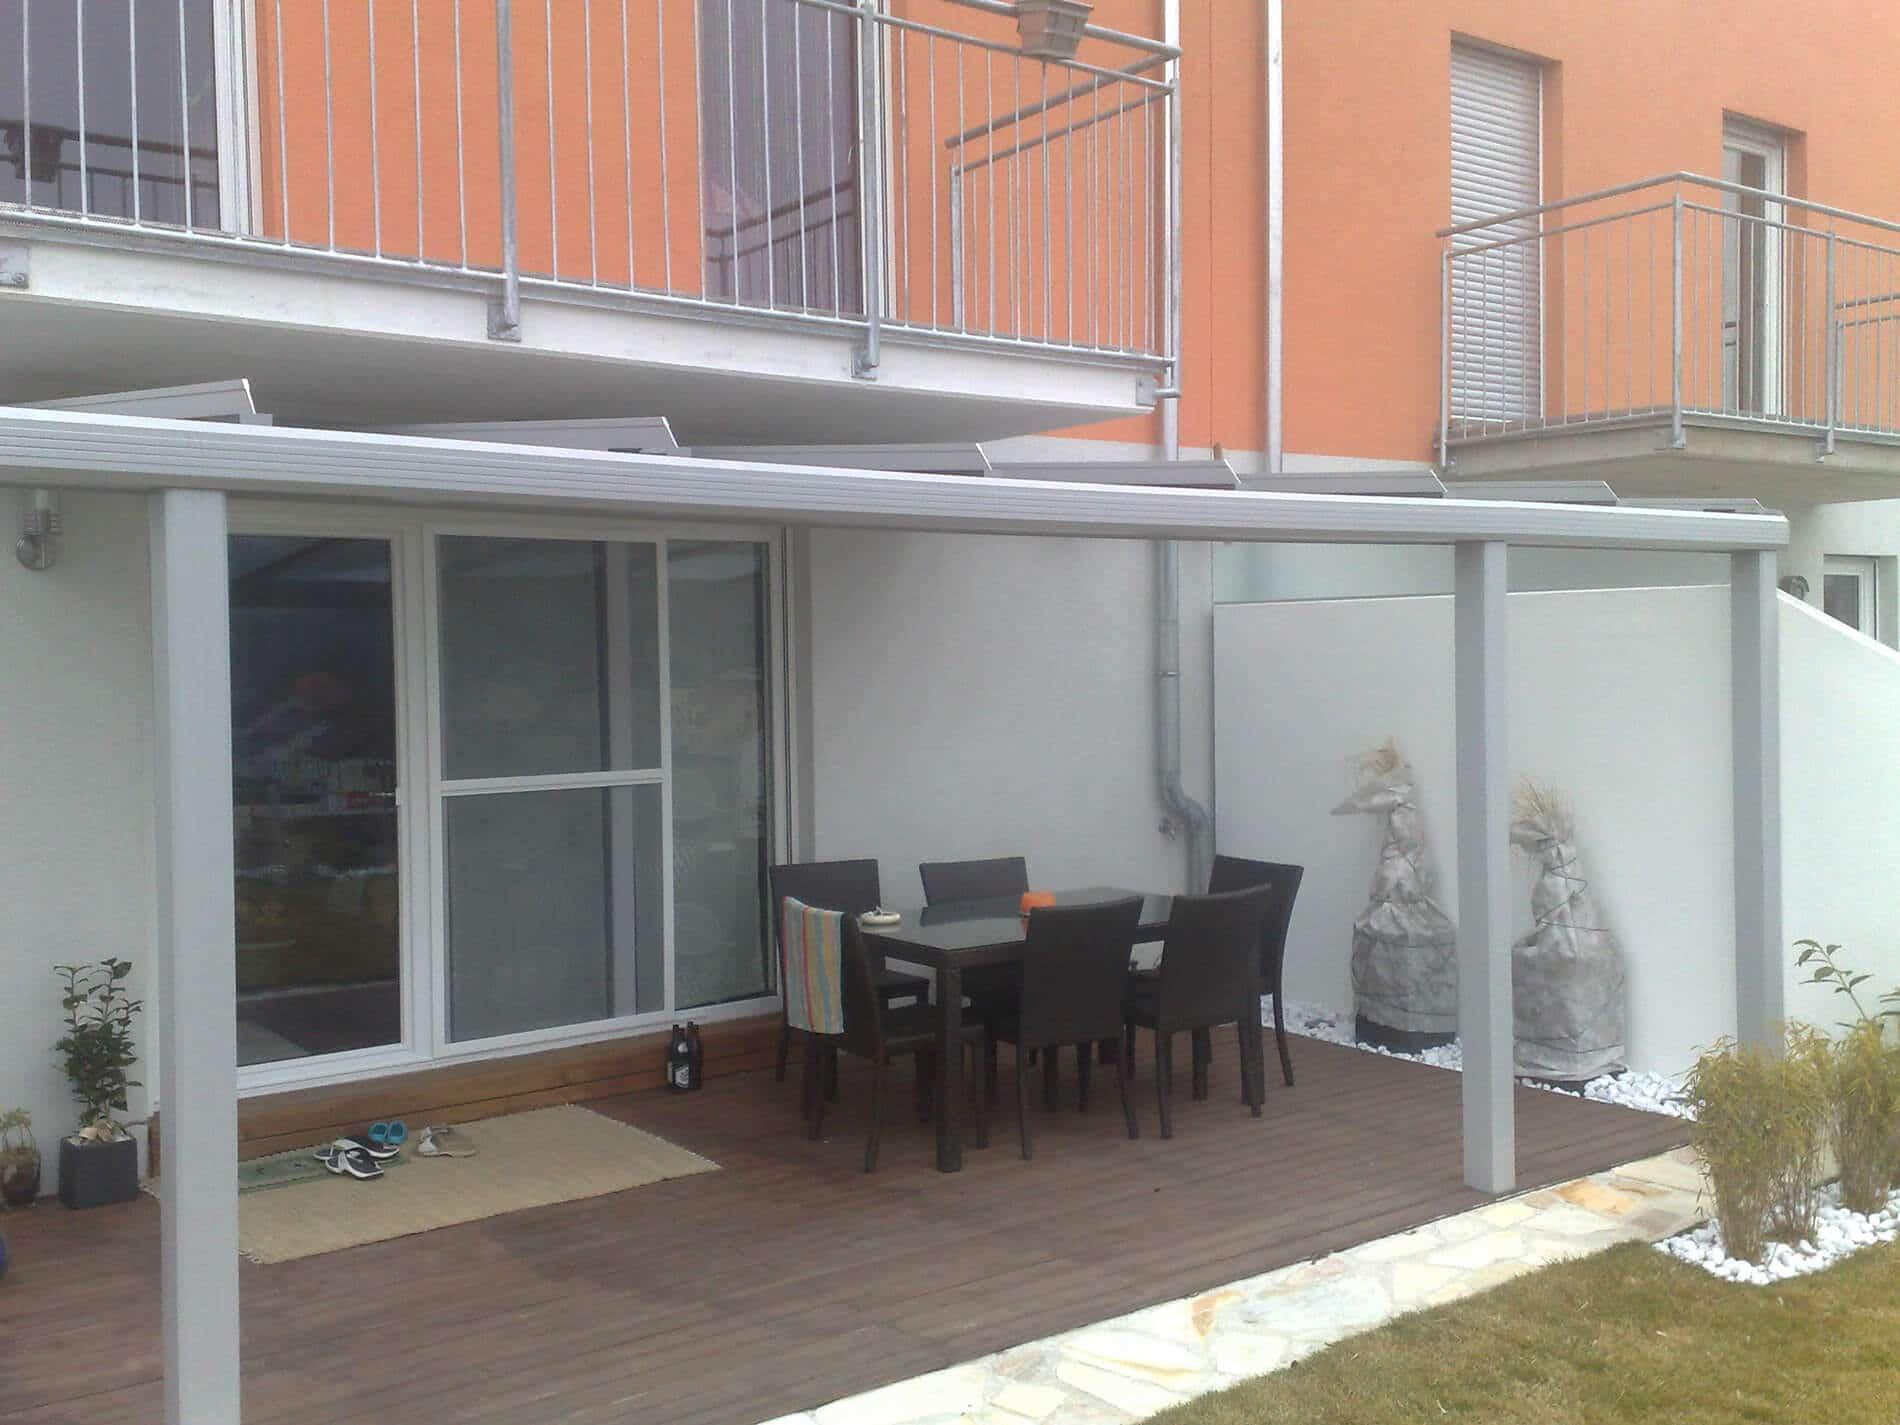 Terrassenüberdachung Glas Preis